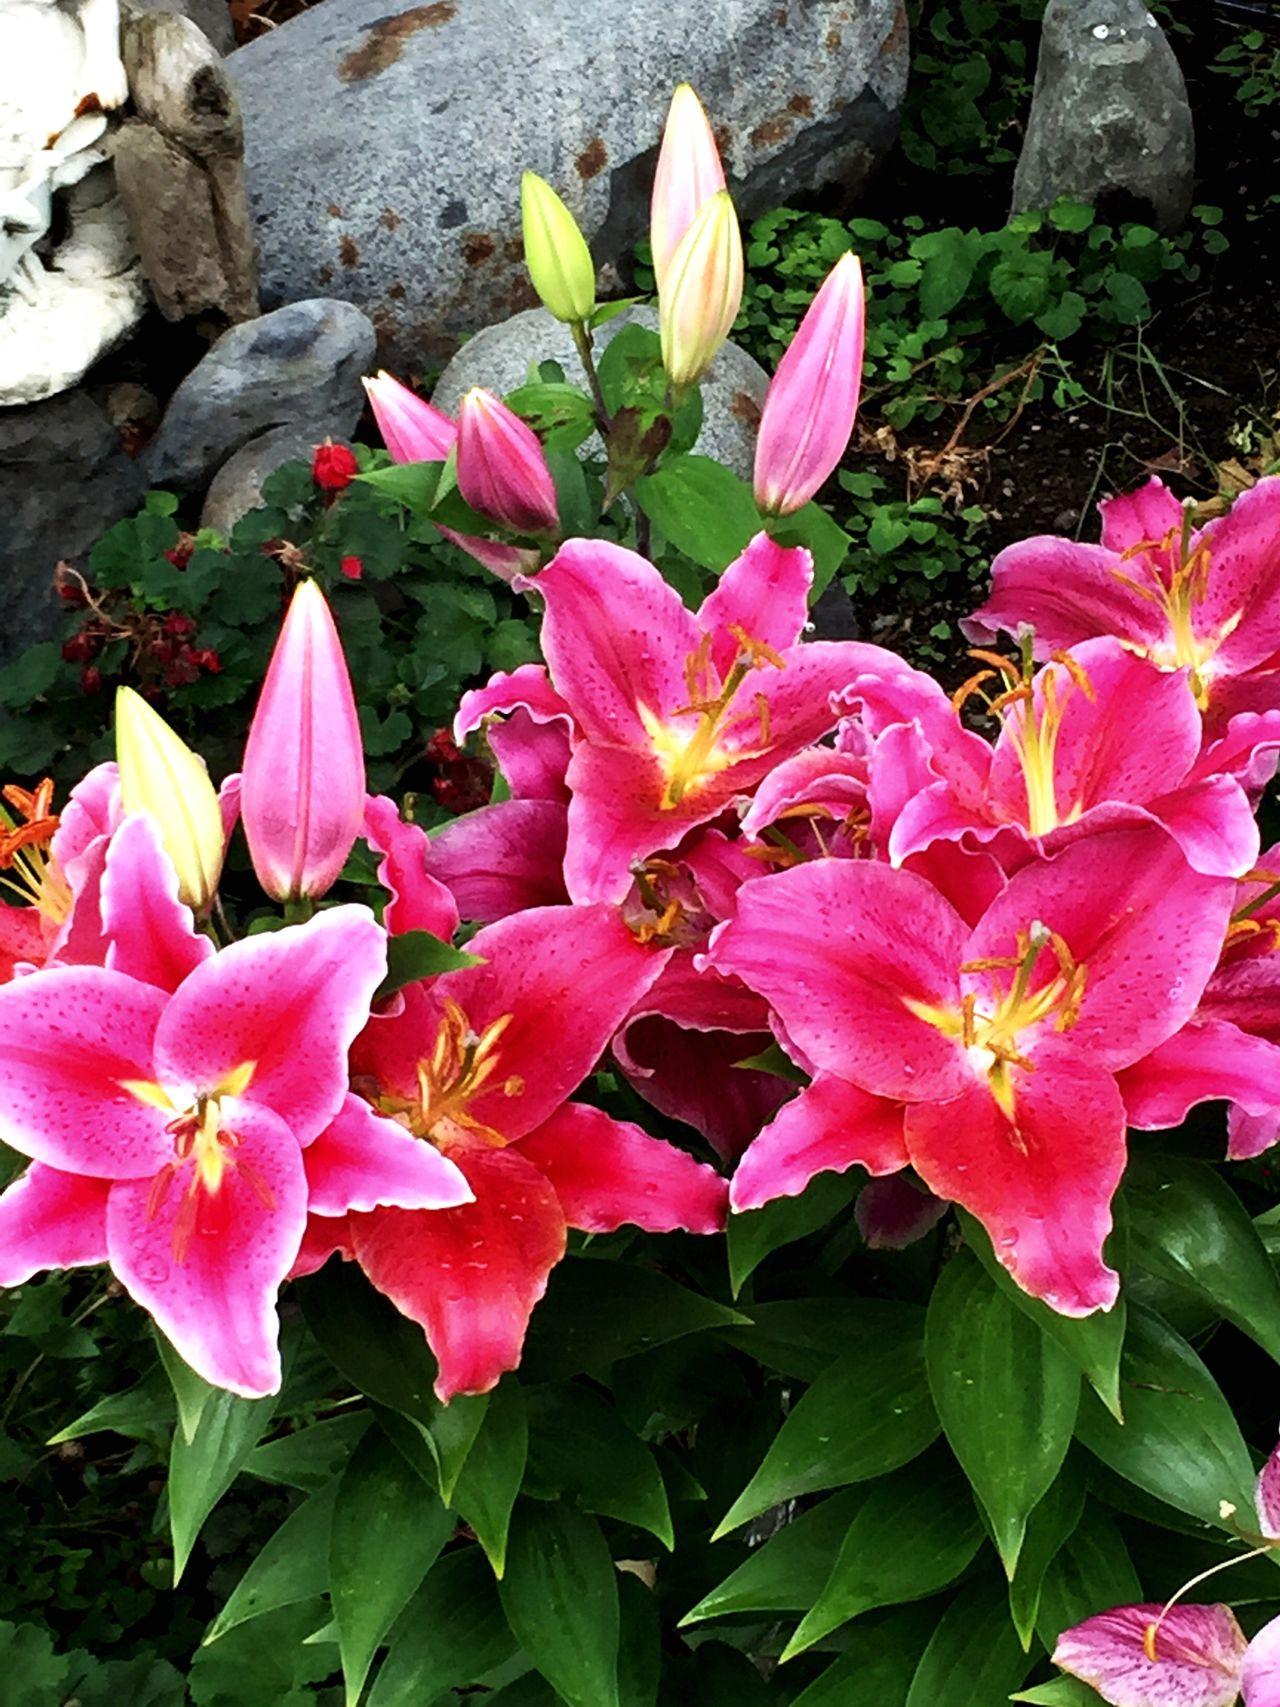 Lilies Flower Pink Color In Bloom